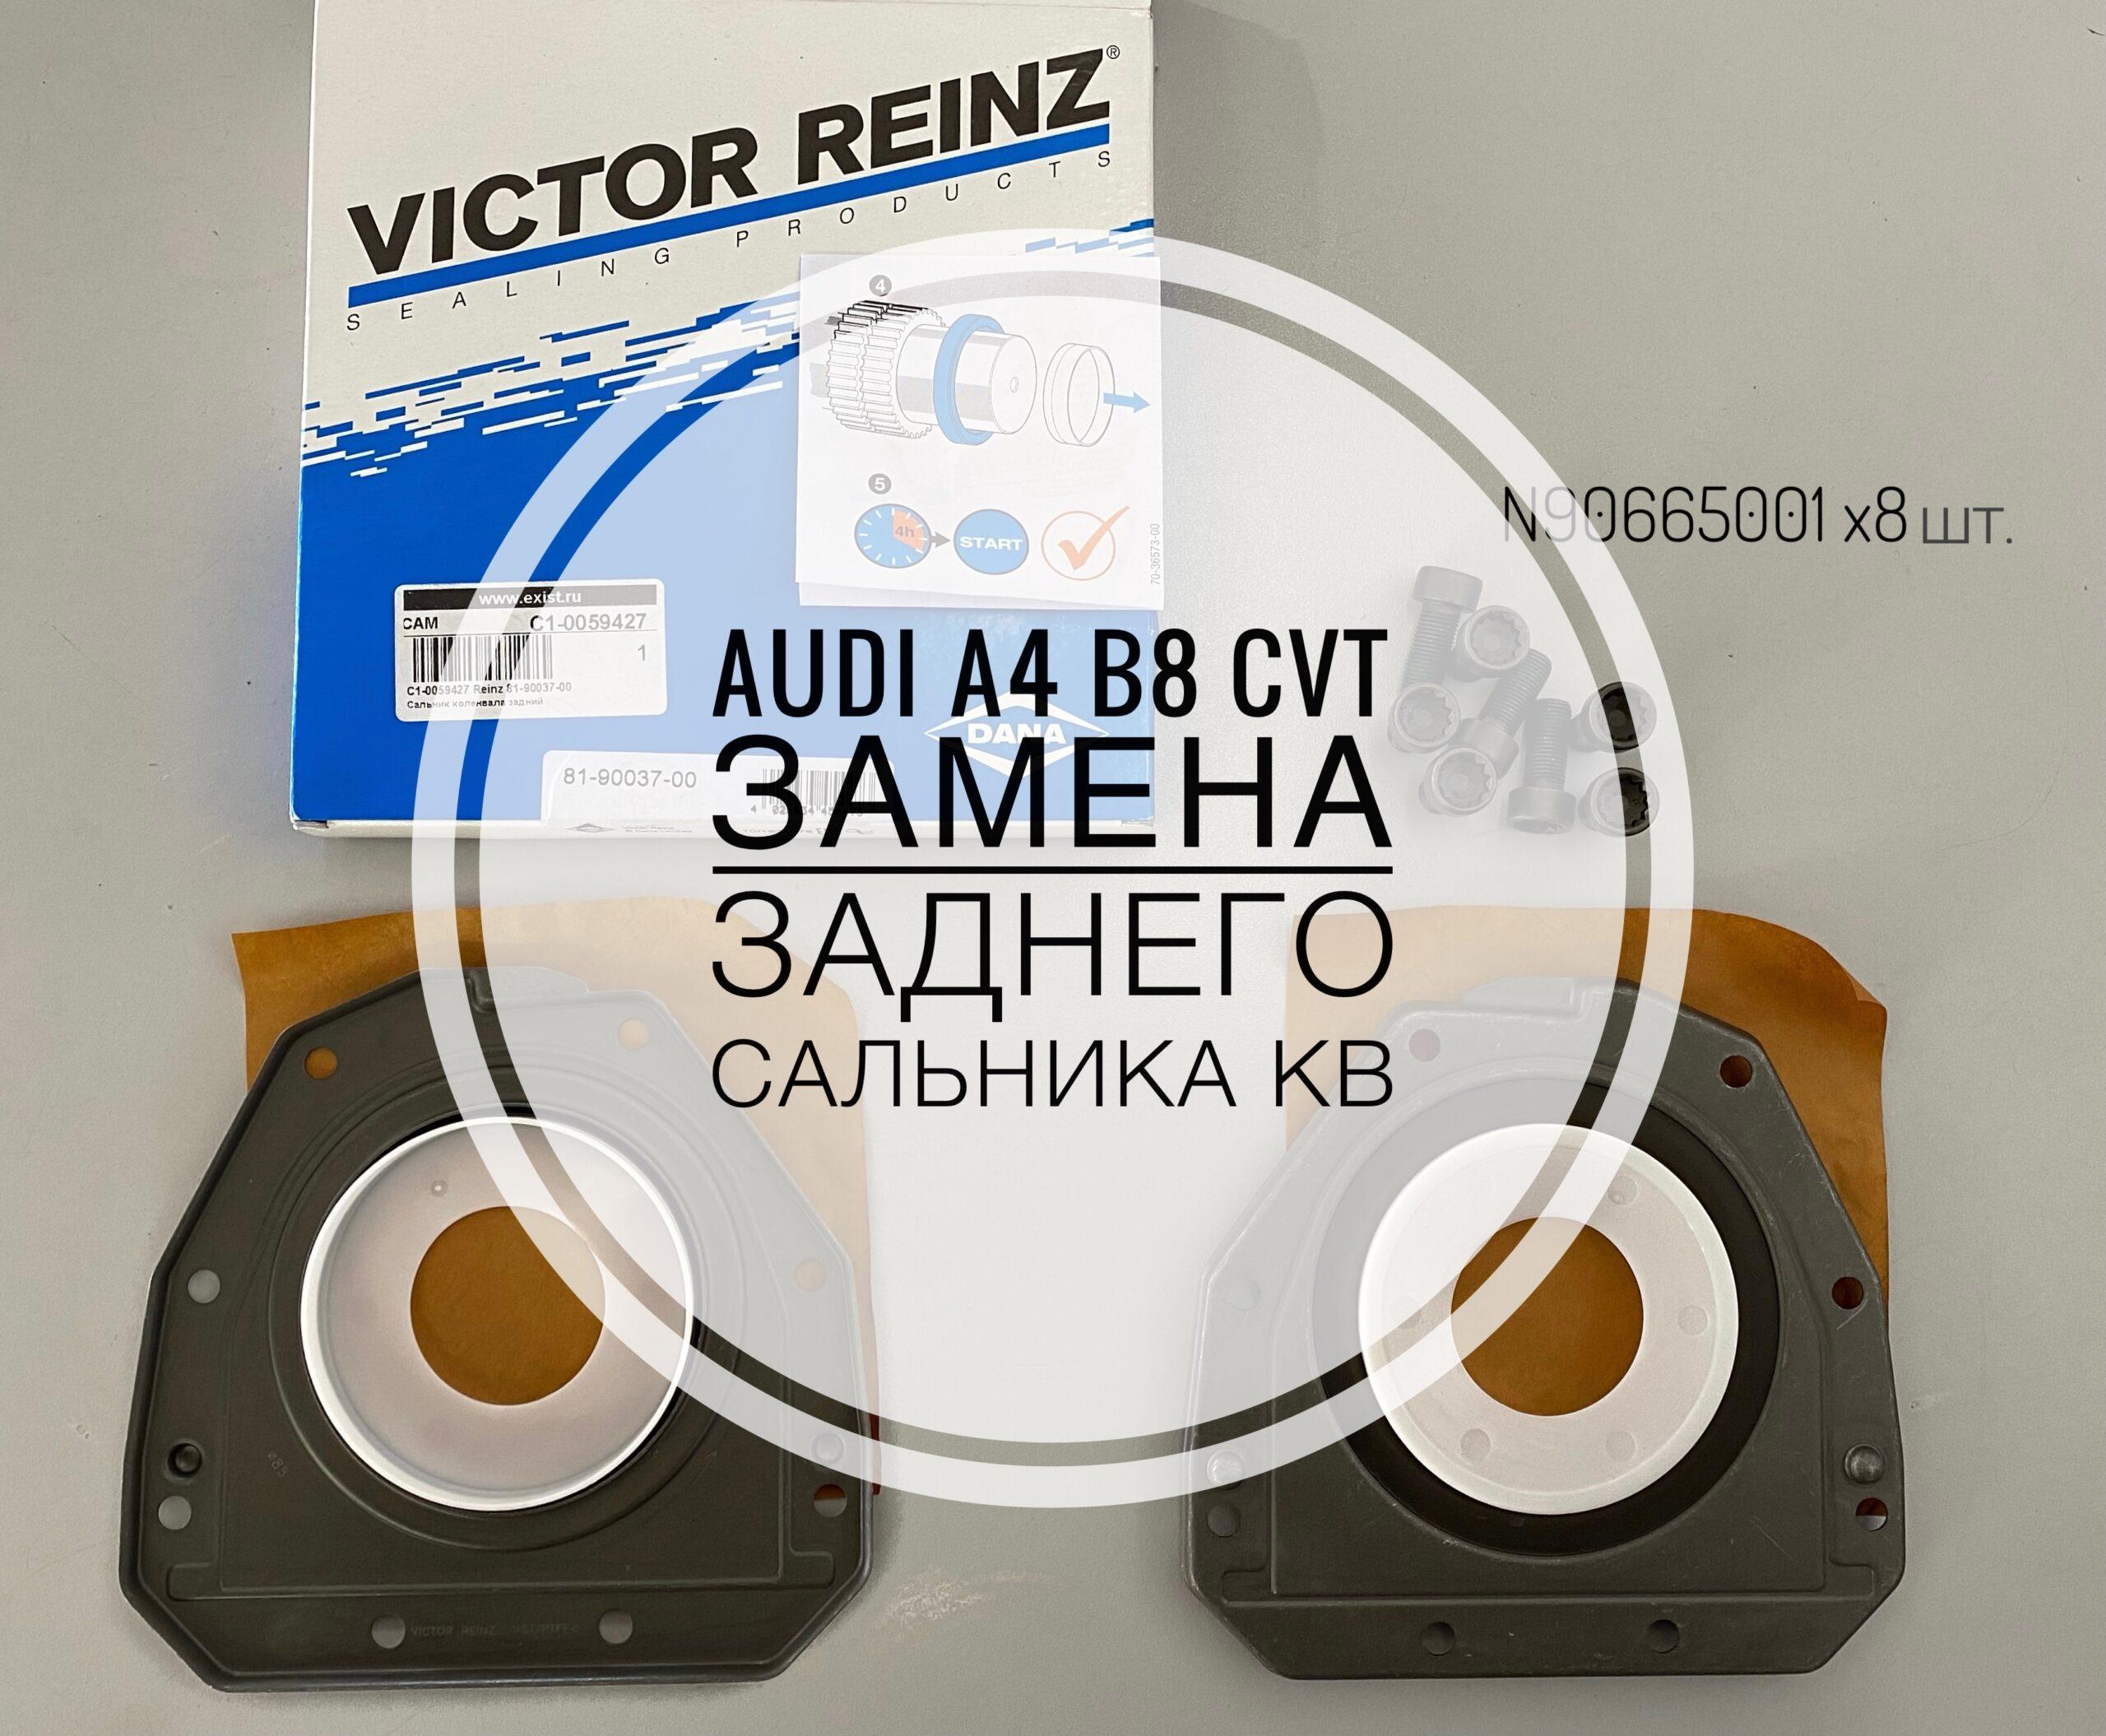 Замена заднего сальника коленвала Audi A4 1.8 TFSI на вариаторе (EA888 Gen2)